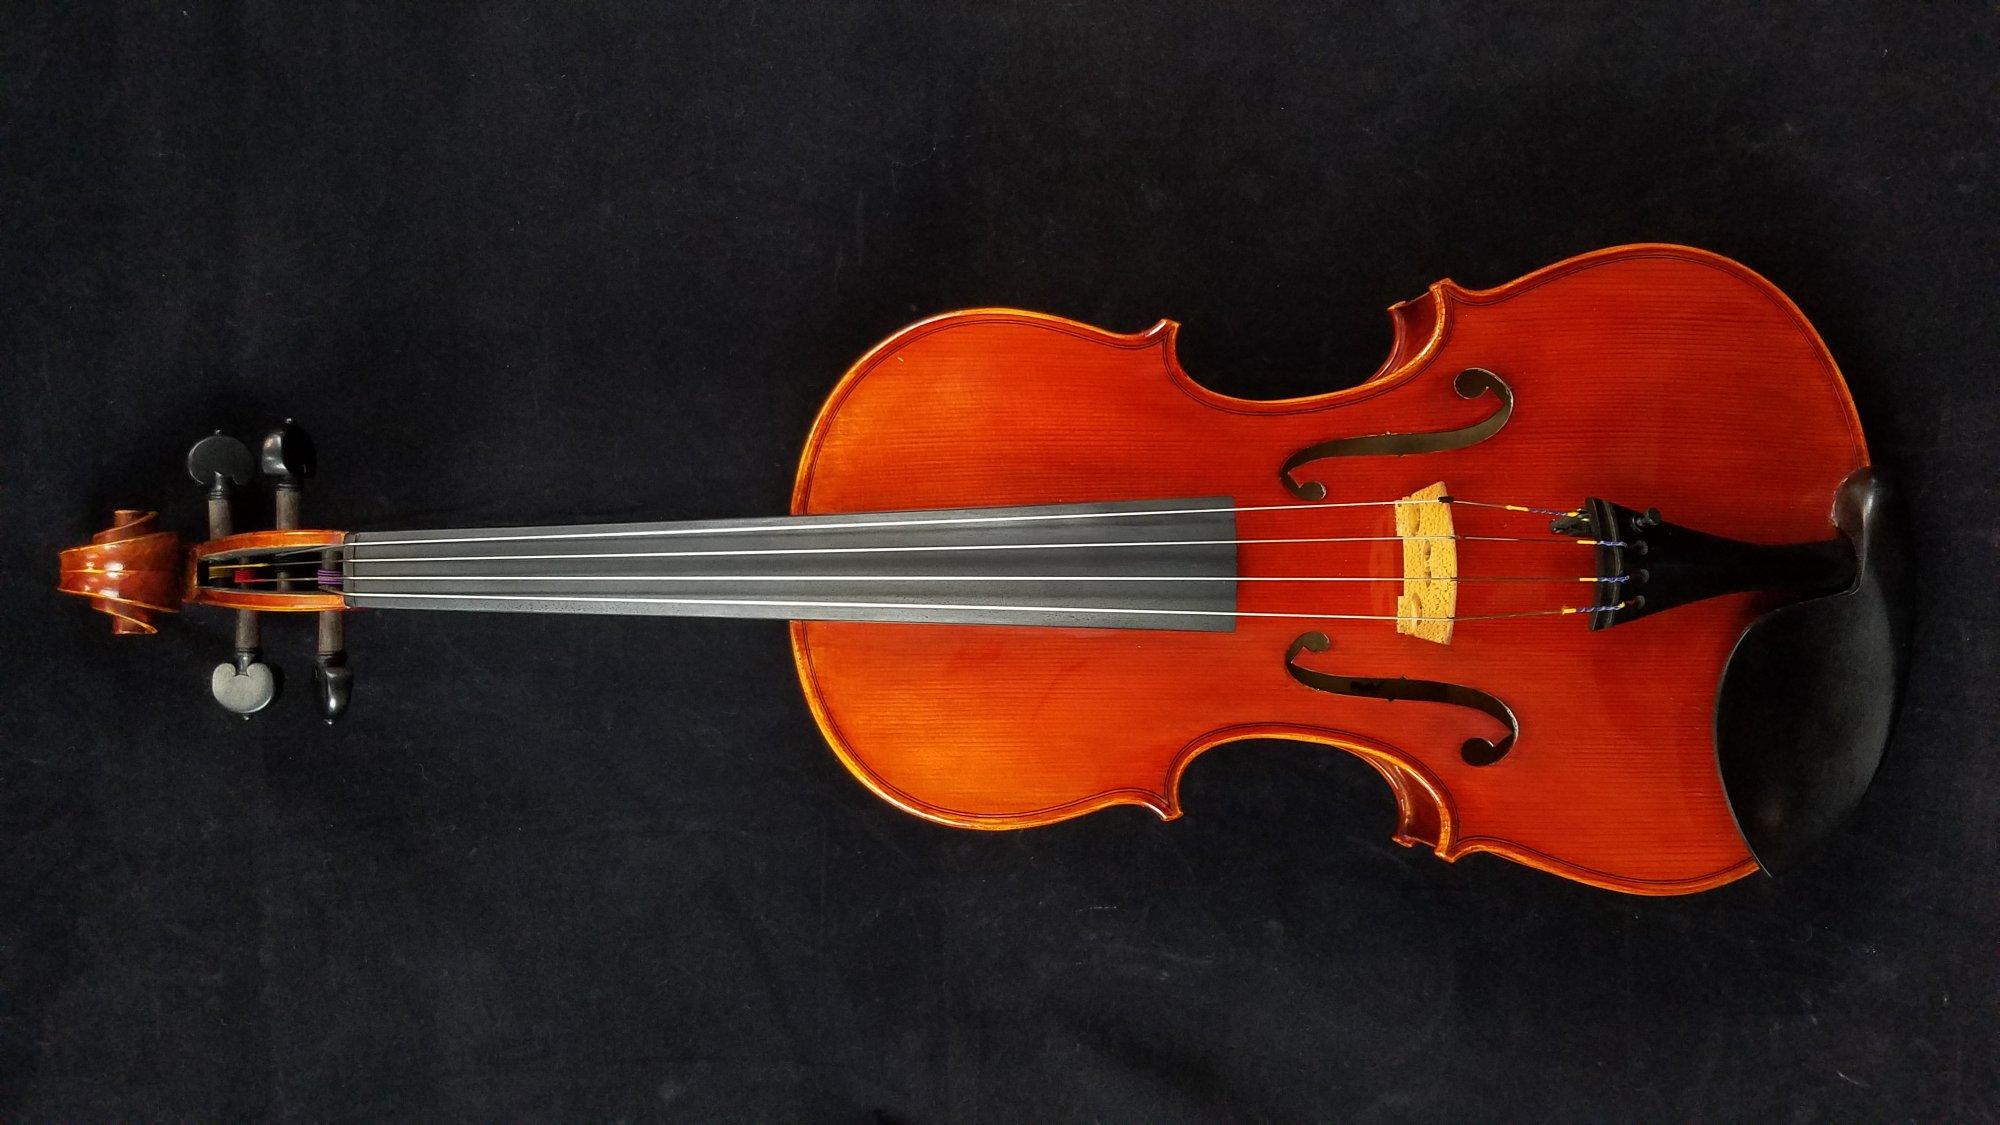 FirePhoenix FA300 Vibrante Viola 15.5